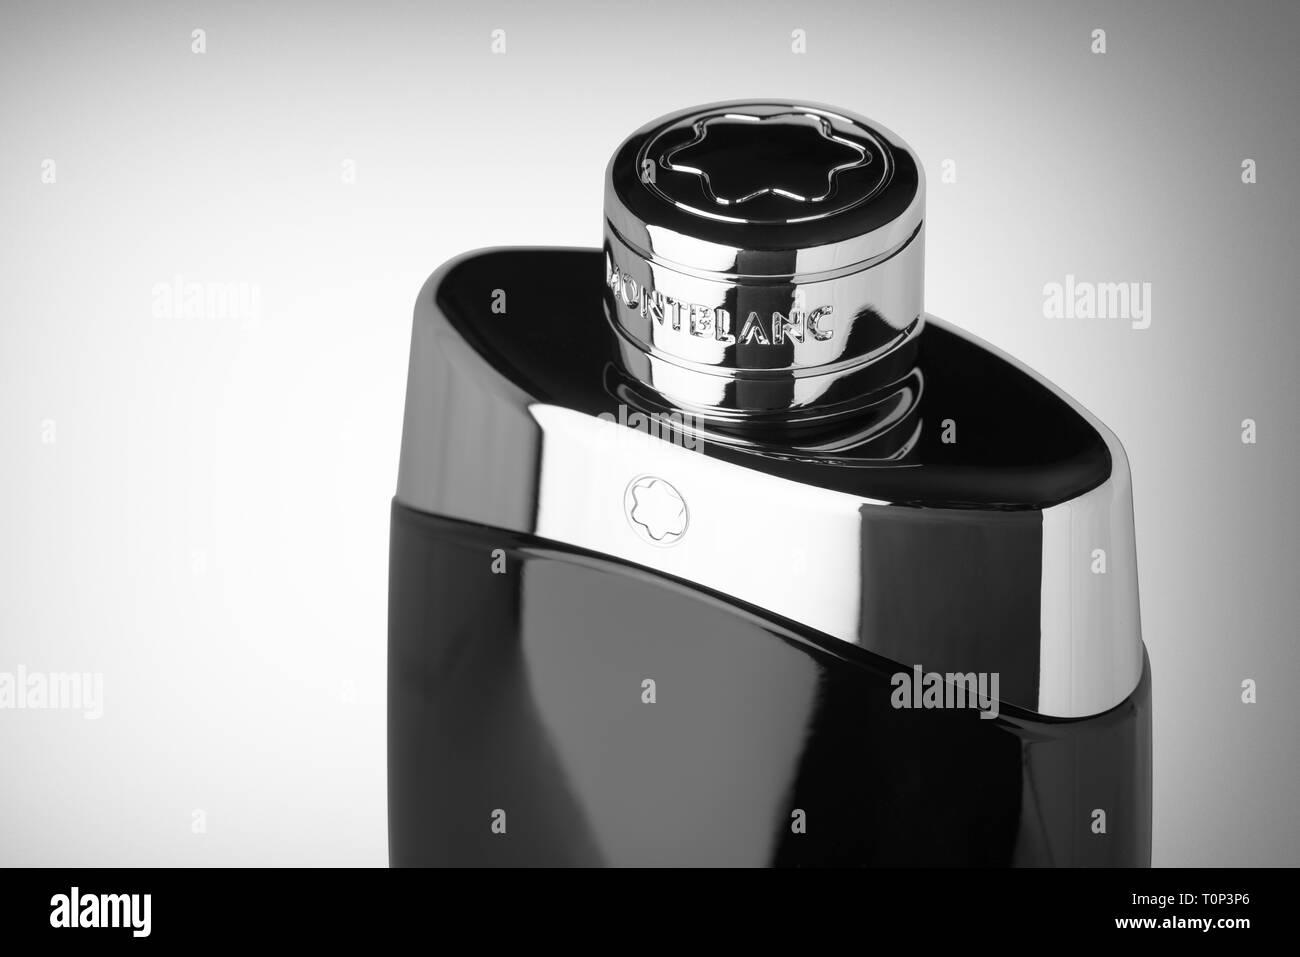 Mont Blanc Legend eau de toilette perfume bottle on a white background. Black and white image. - Stock Image